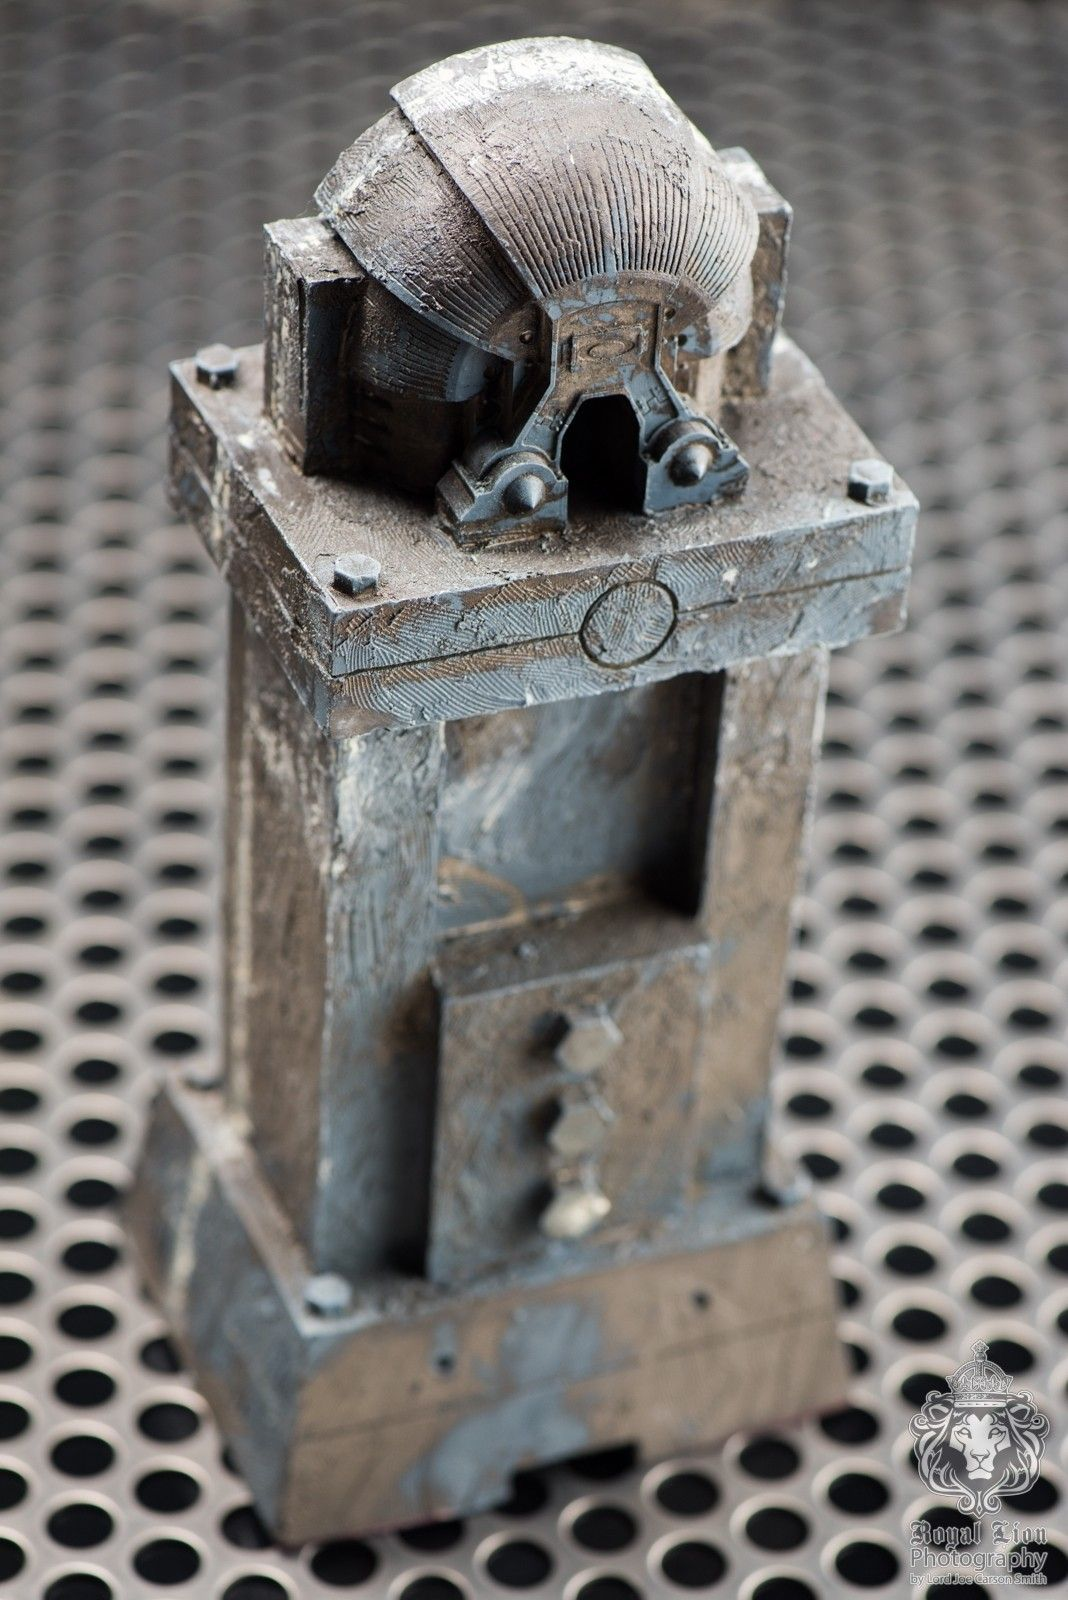 Oakley Bunker Tower Trophy Original Positive Signed by James Lareau - Another Major Price Drop - ND8_3458.jpg